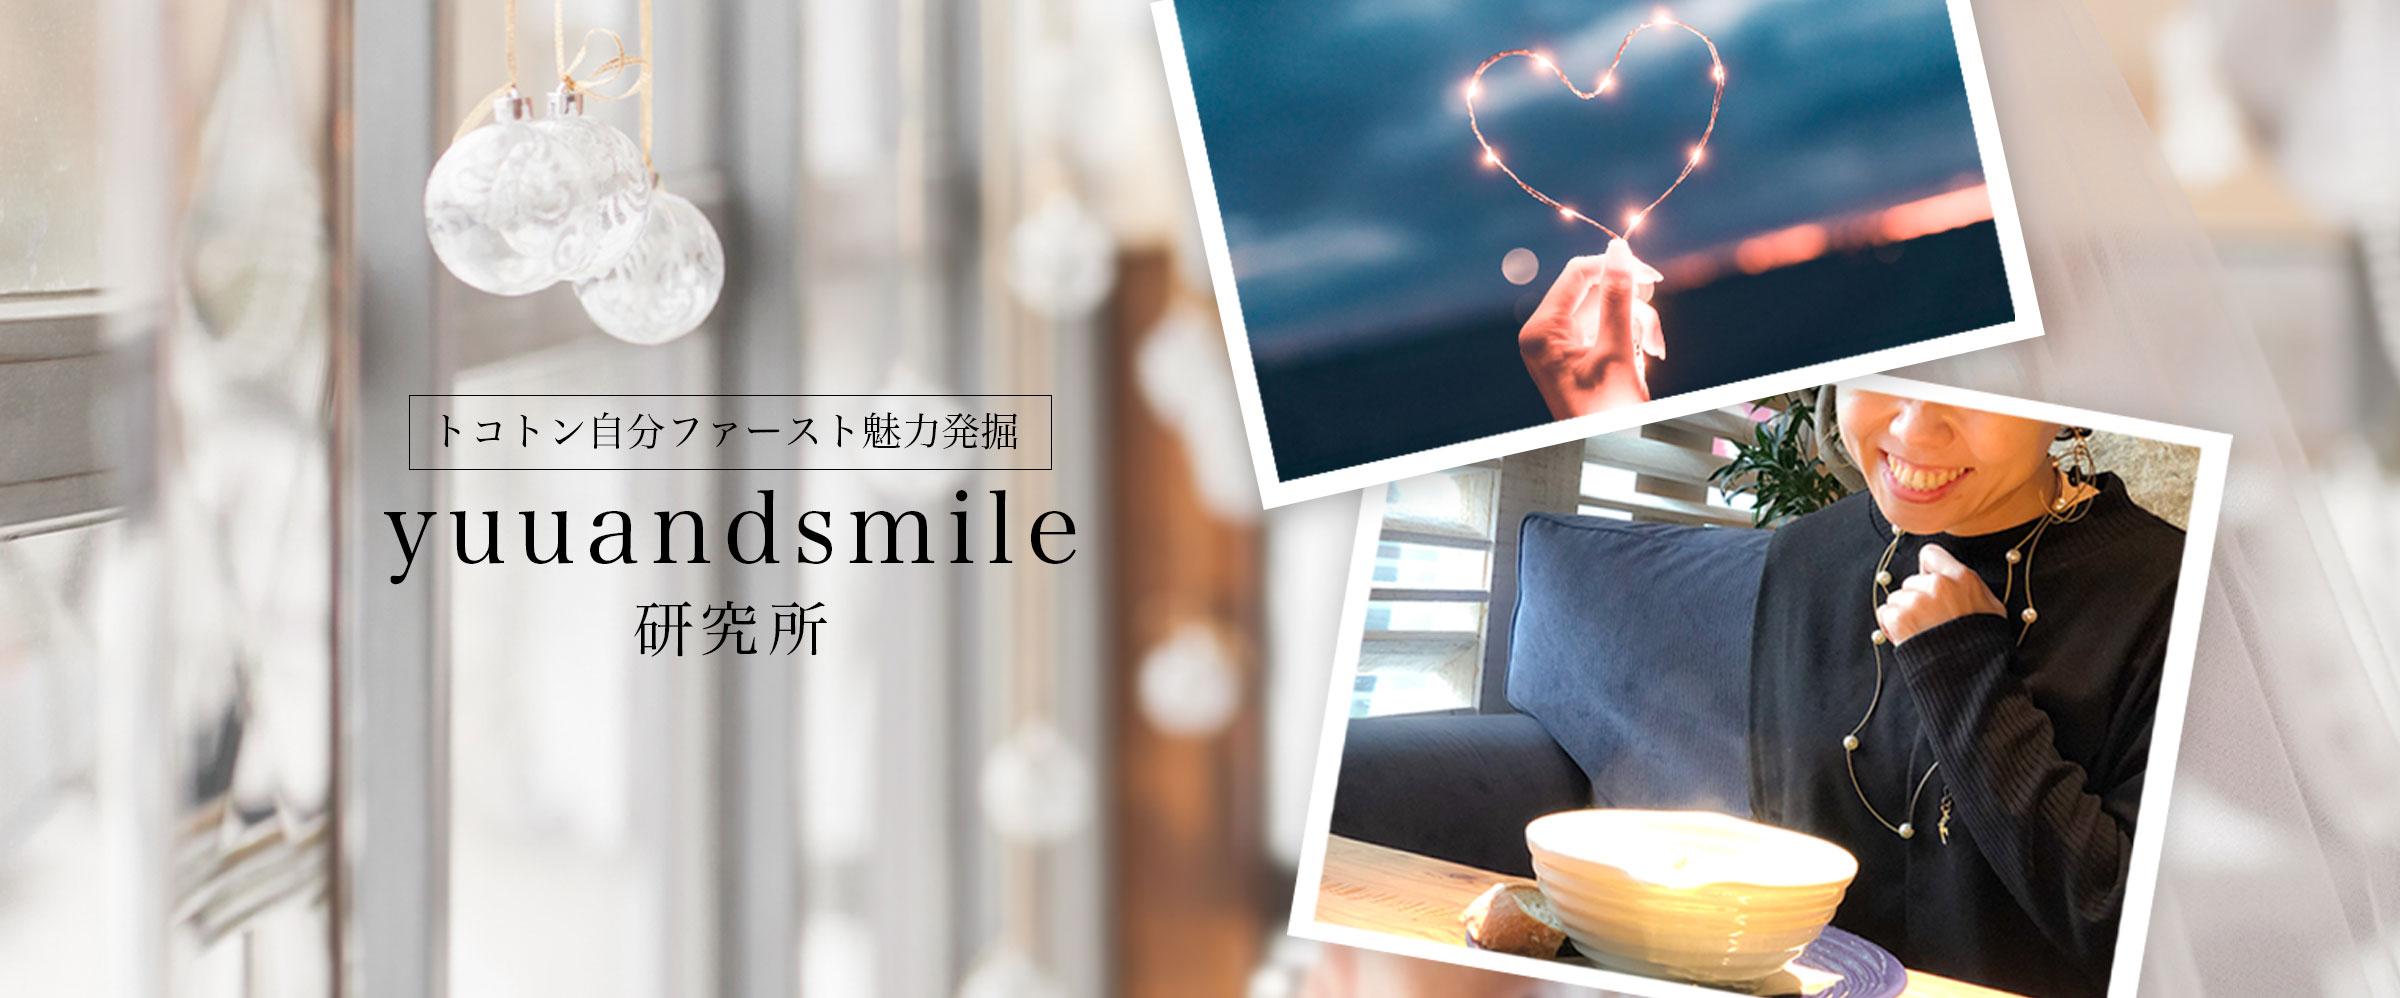 yuuandsmile研究所のイメージ画像